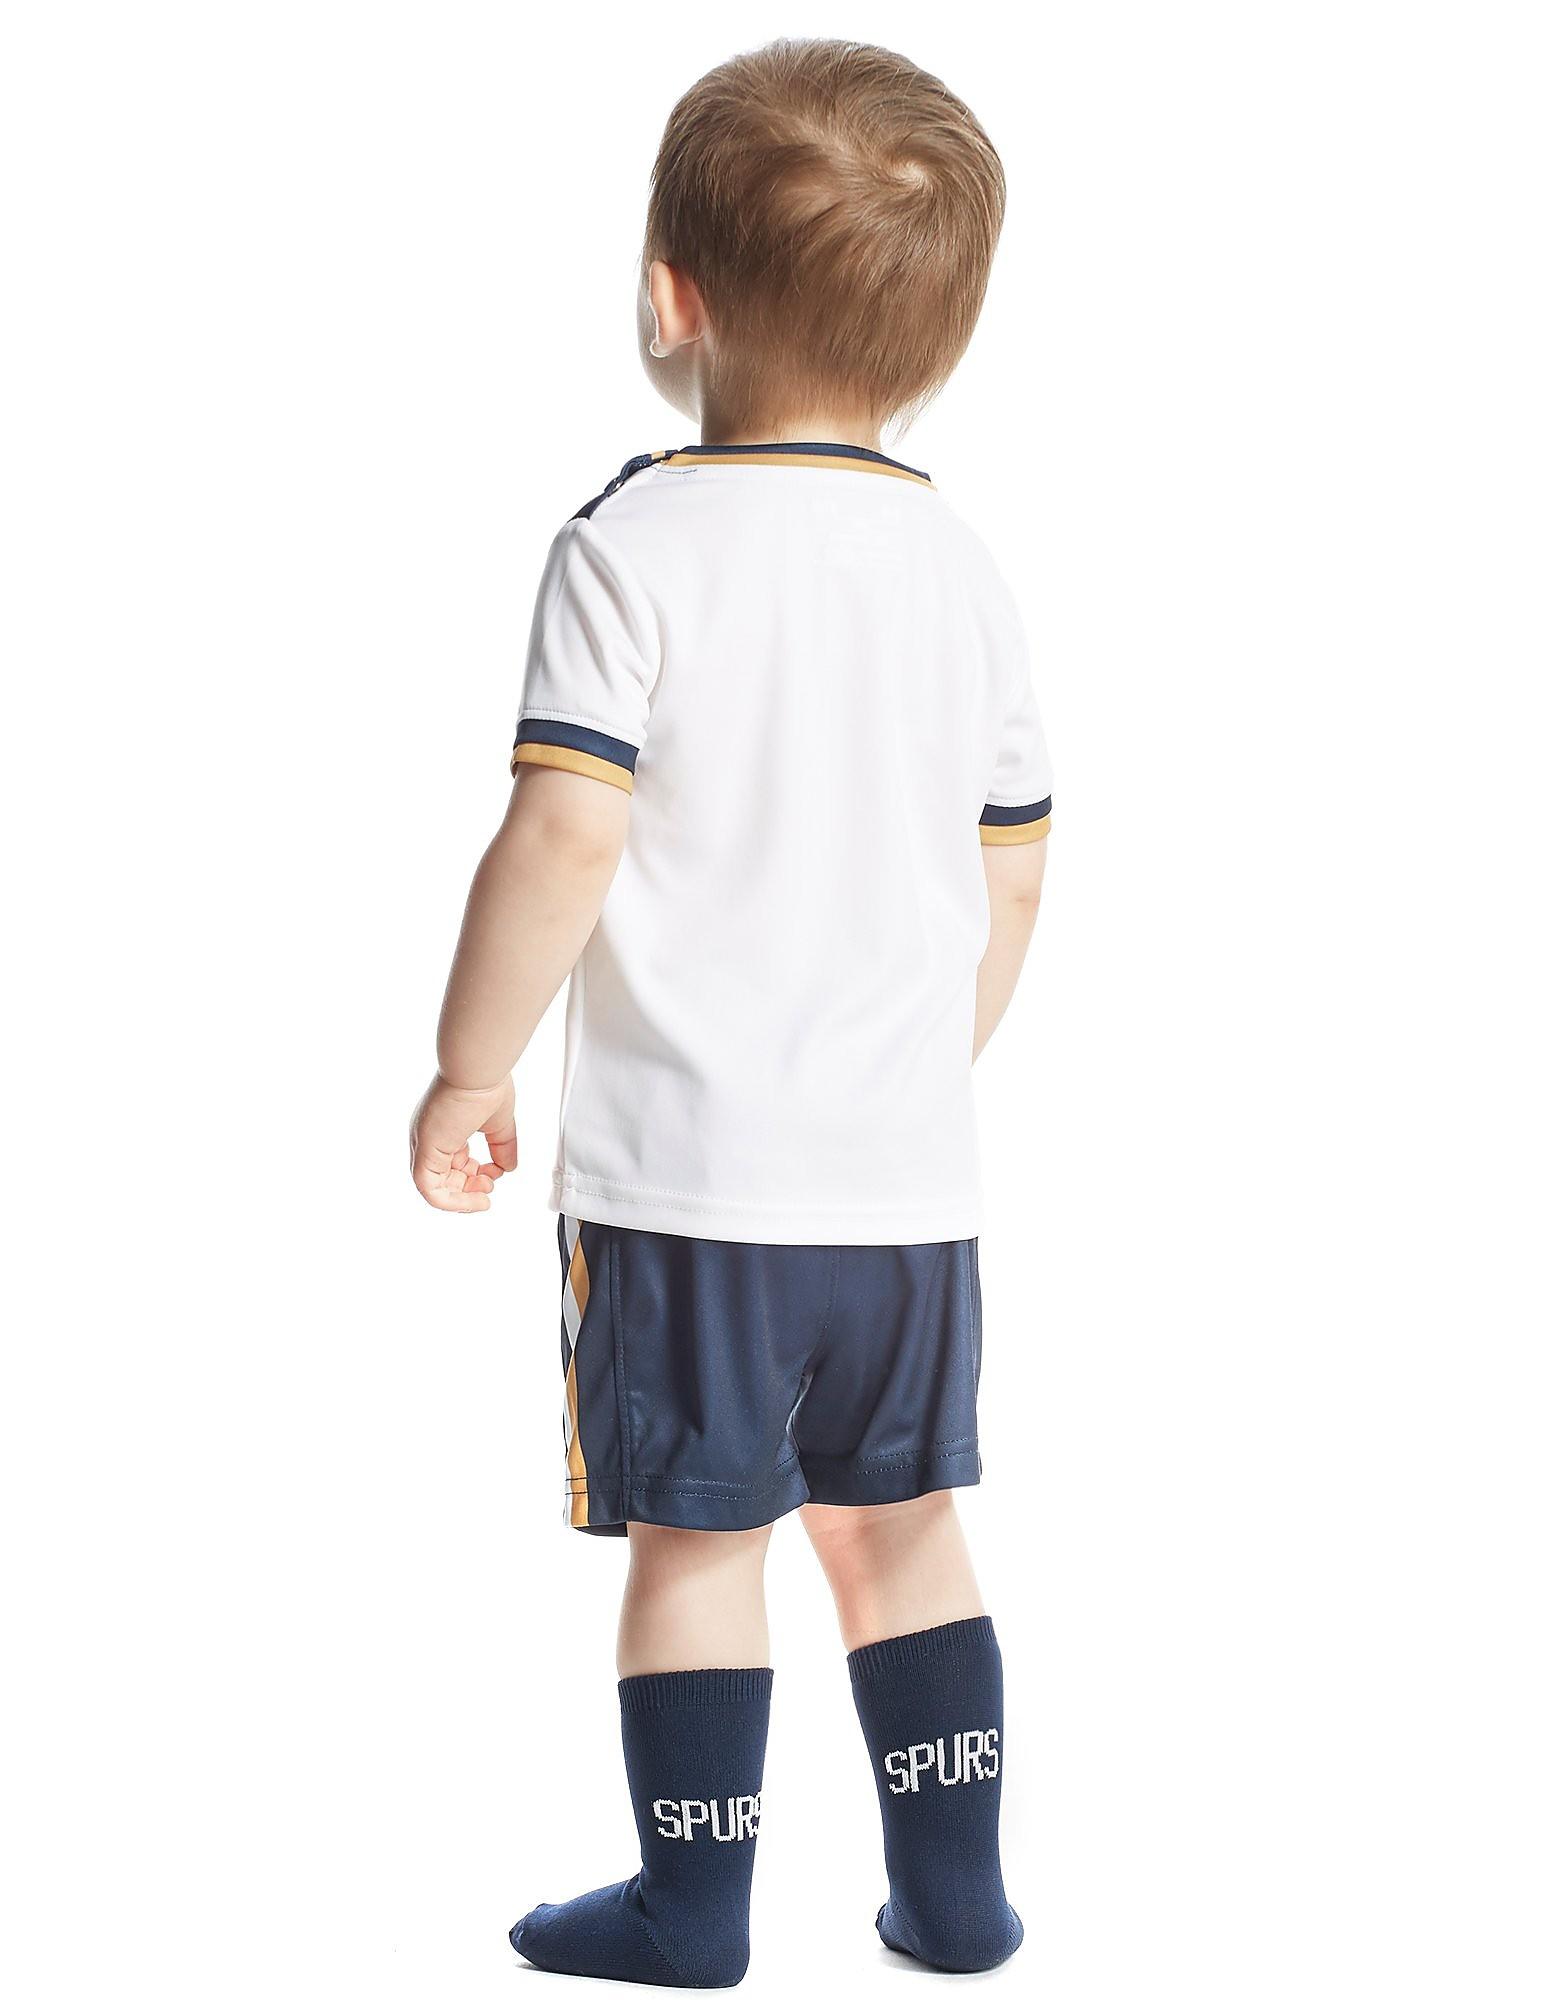 Under Armour Tottenham Hottspur FC 2016/17 Home Kit Infant